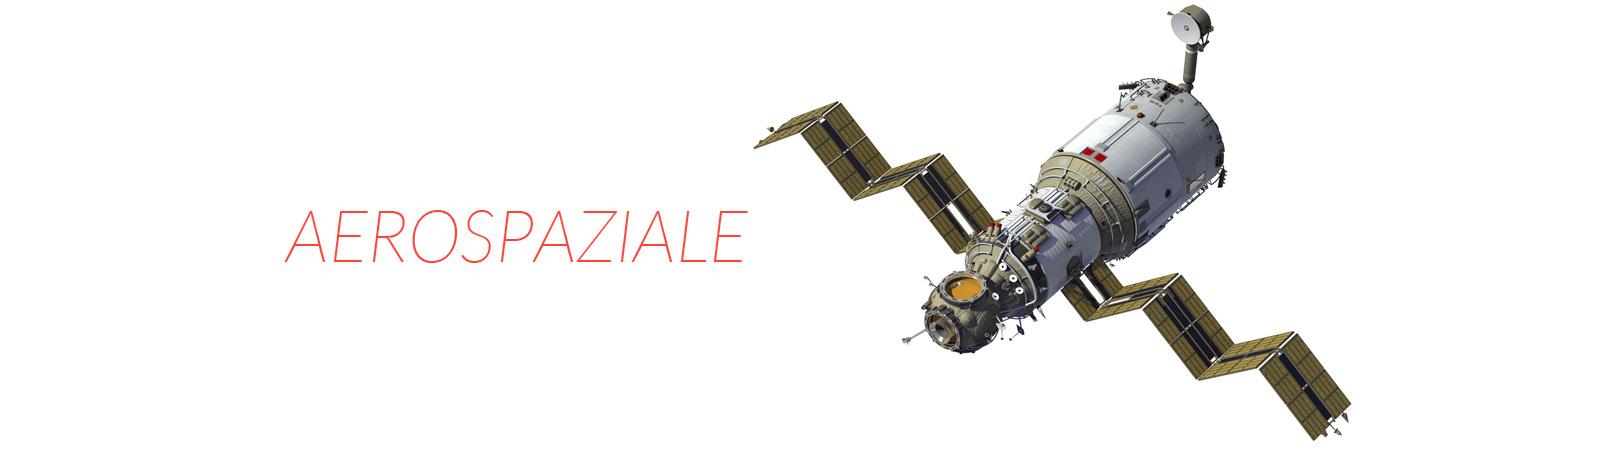 aerospaziale1_slide